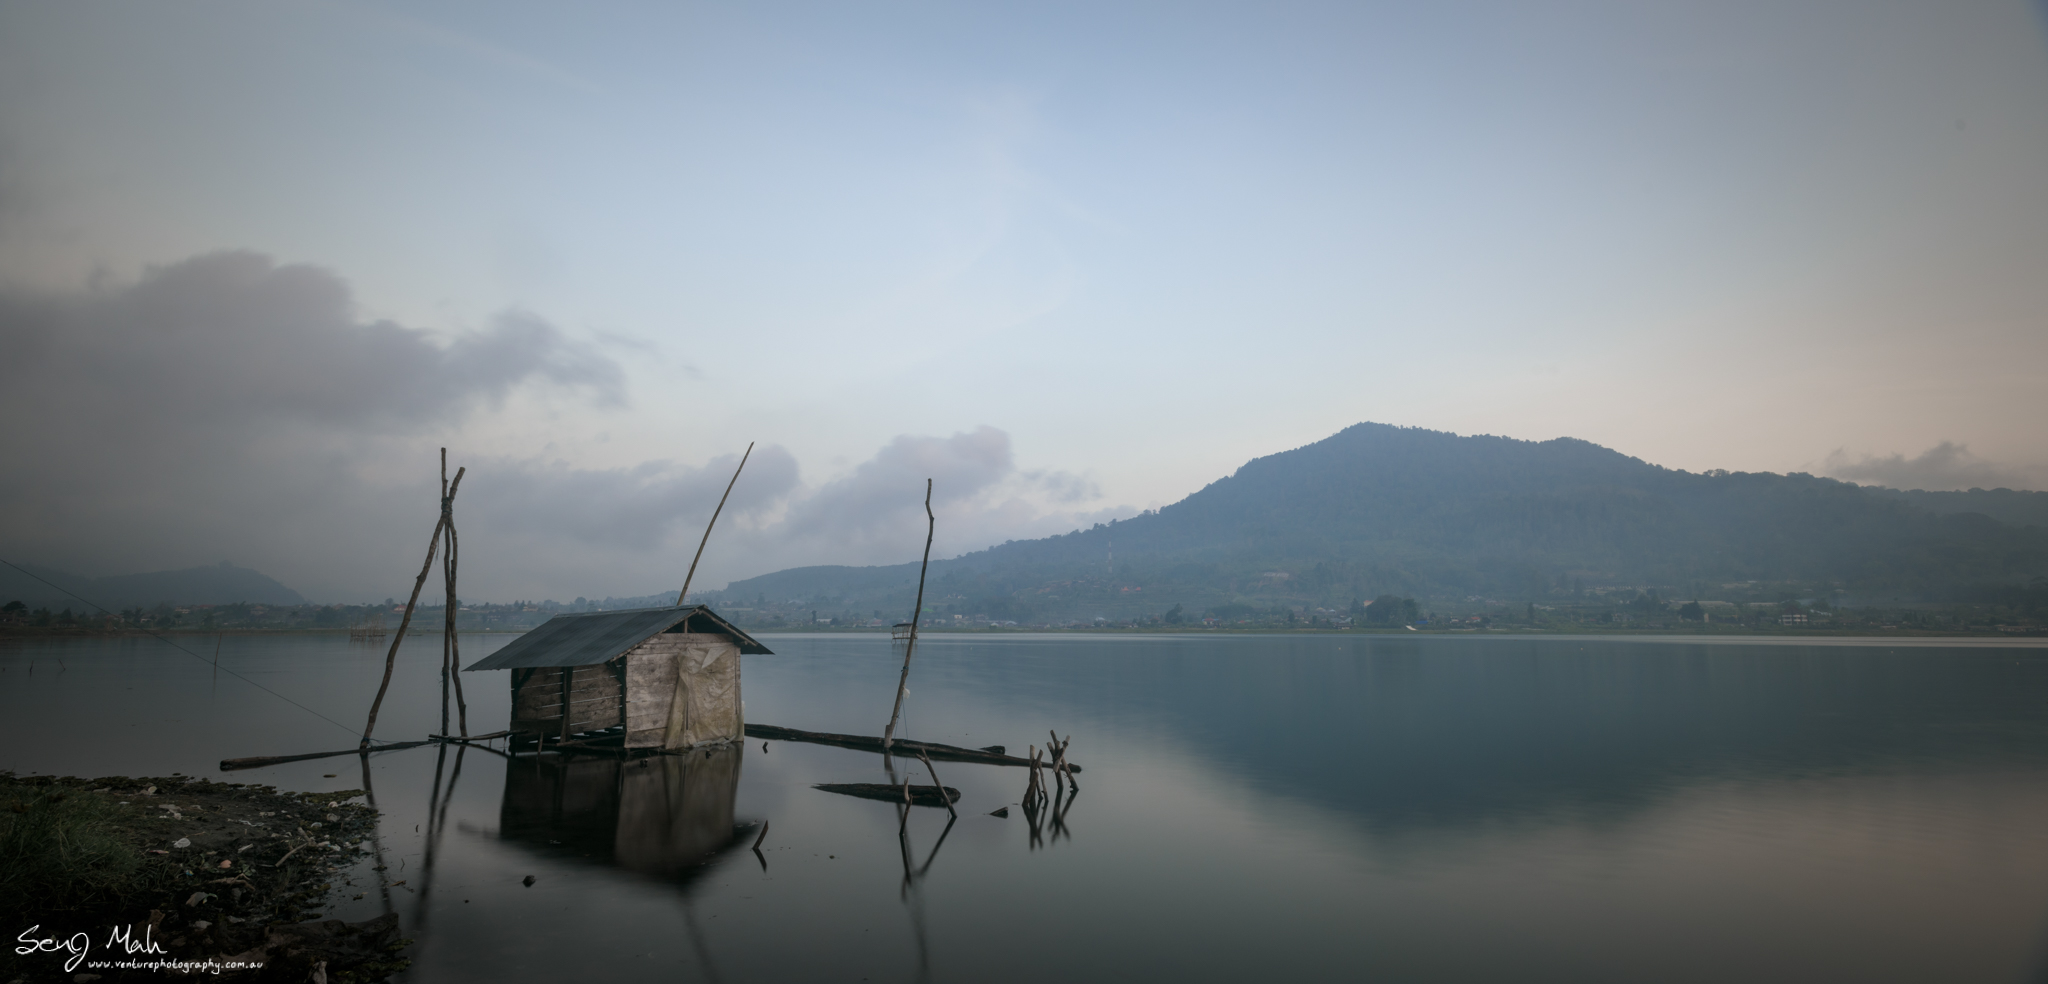 Lakeside scene in Bali with shack